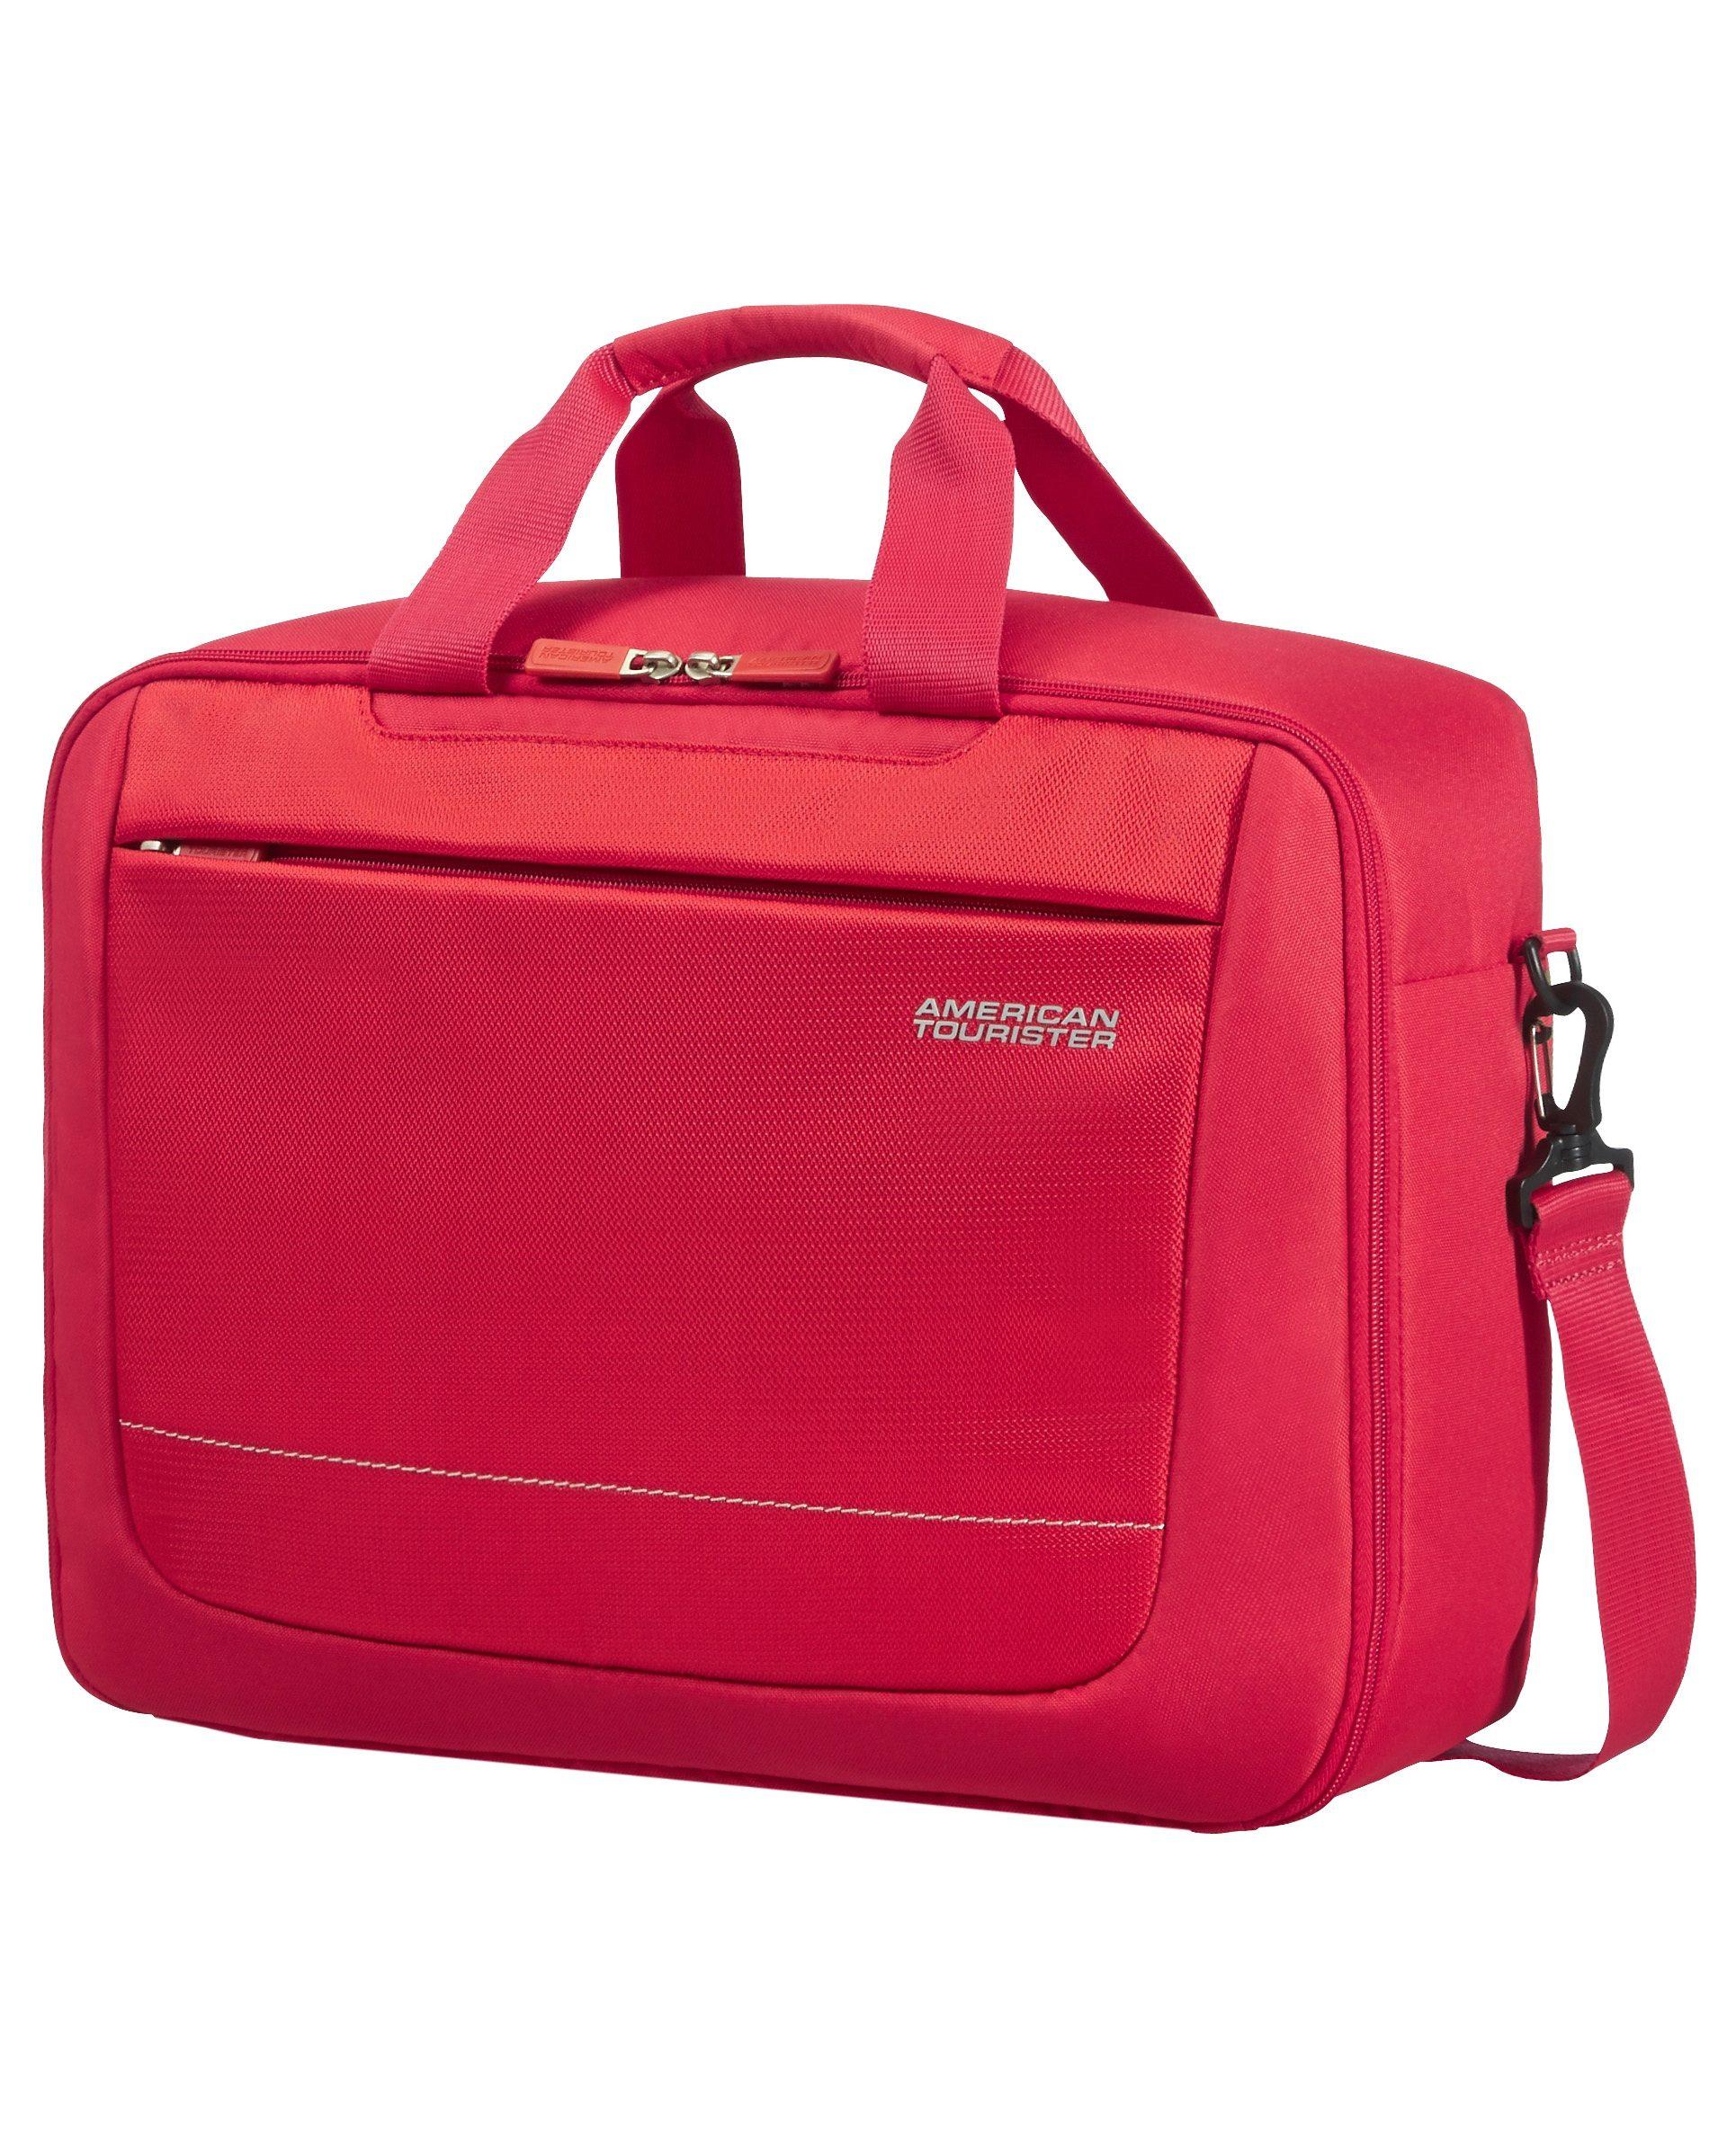 American Tourister Businesstasche zum Rucksack umbaubar, »SPRING HILL 3-WAY BOARDING BAG«